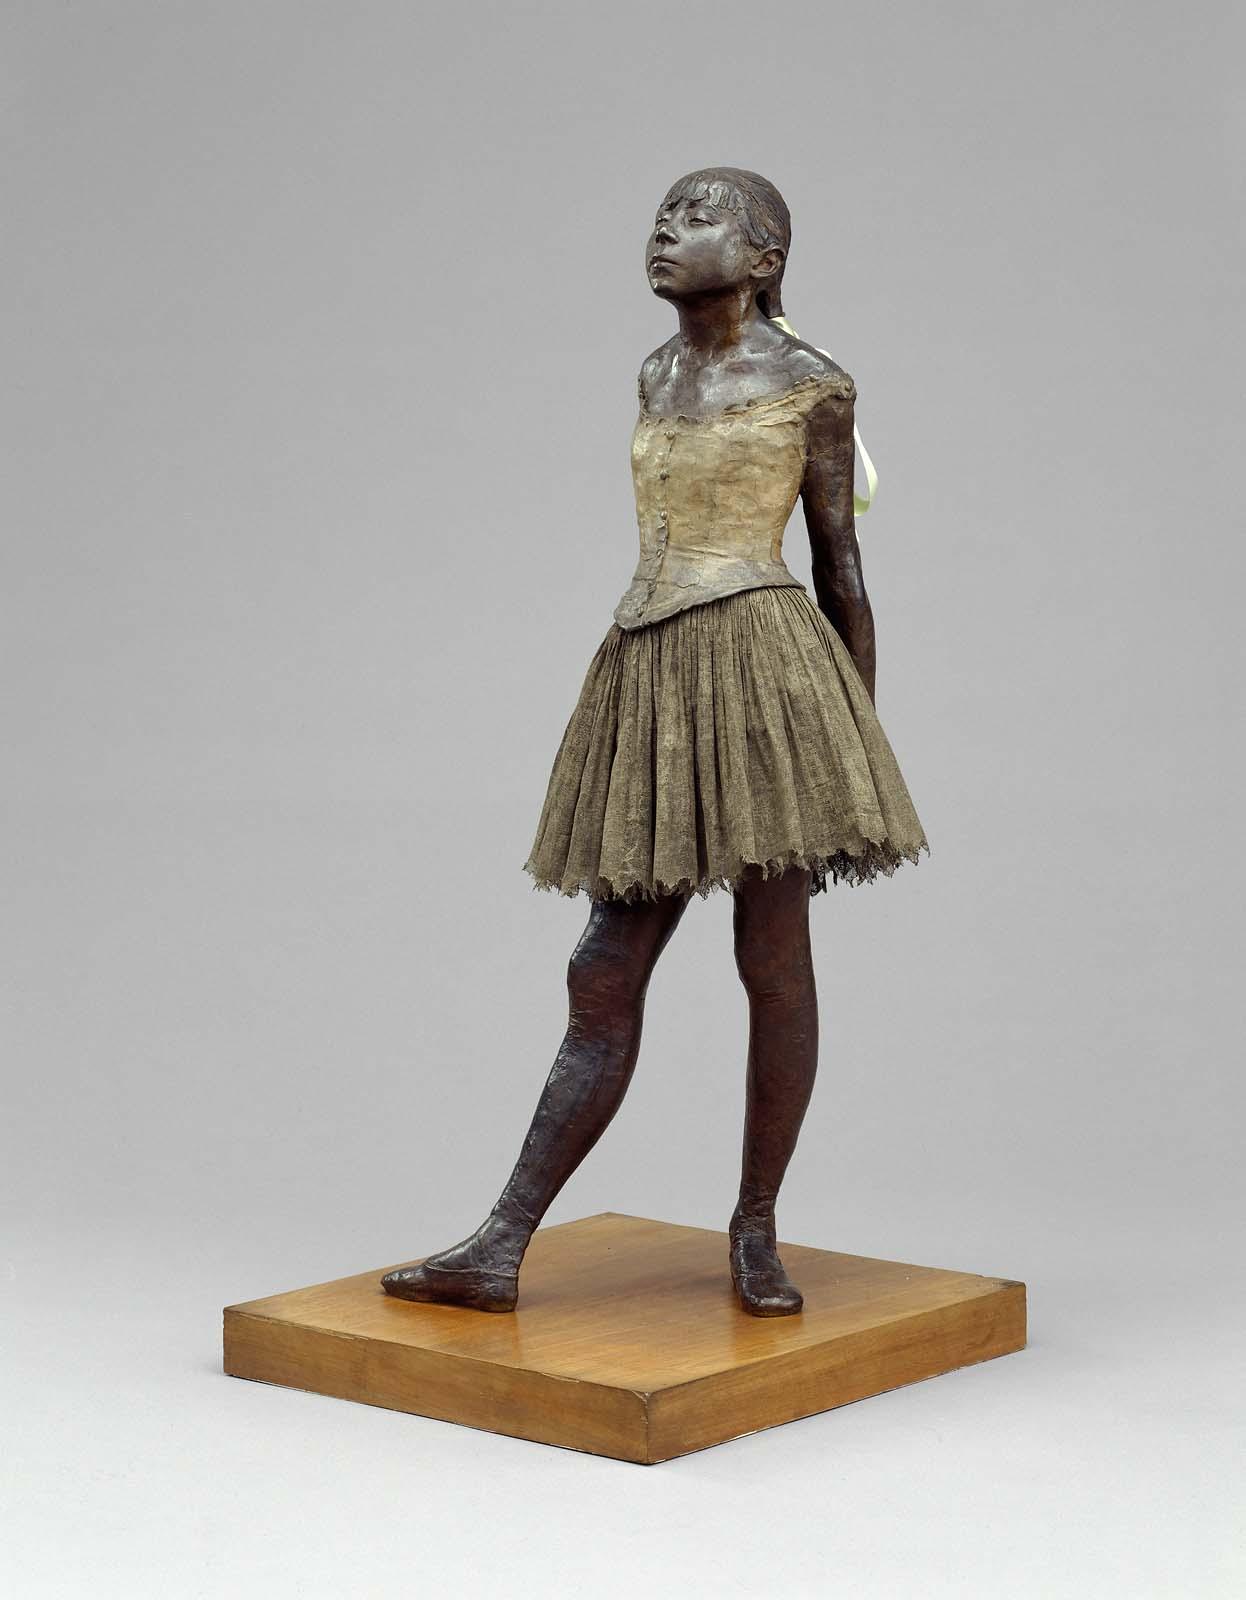 Degas Ballerina Sculpture